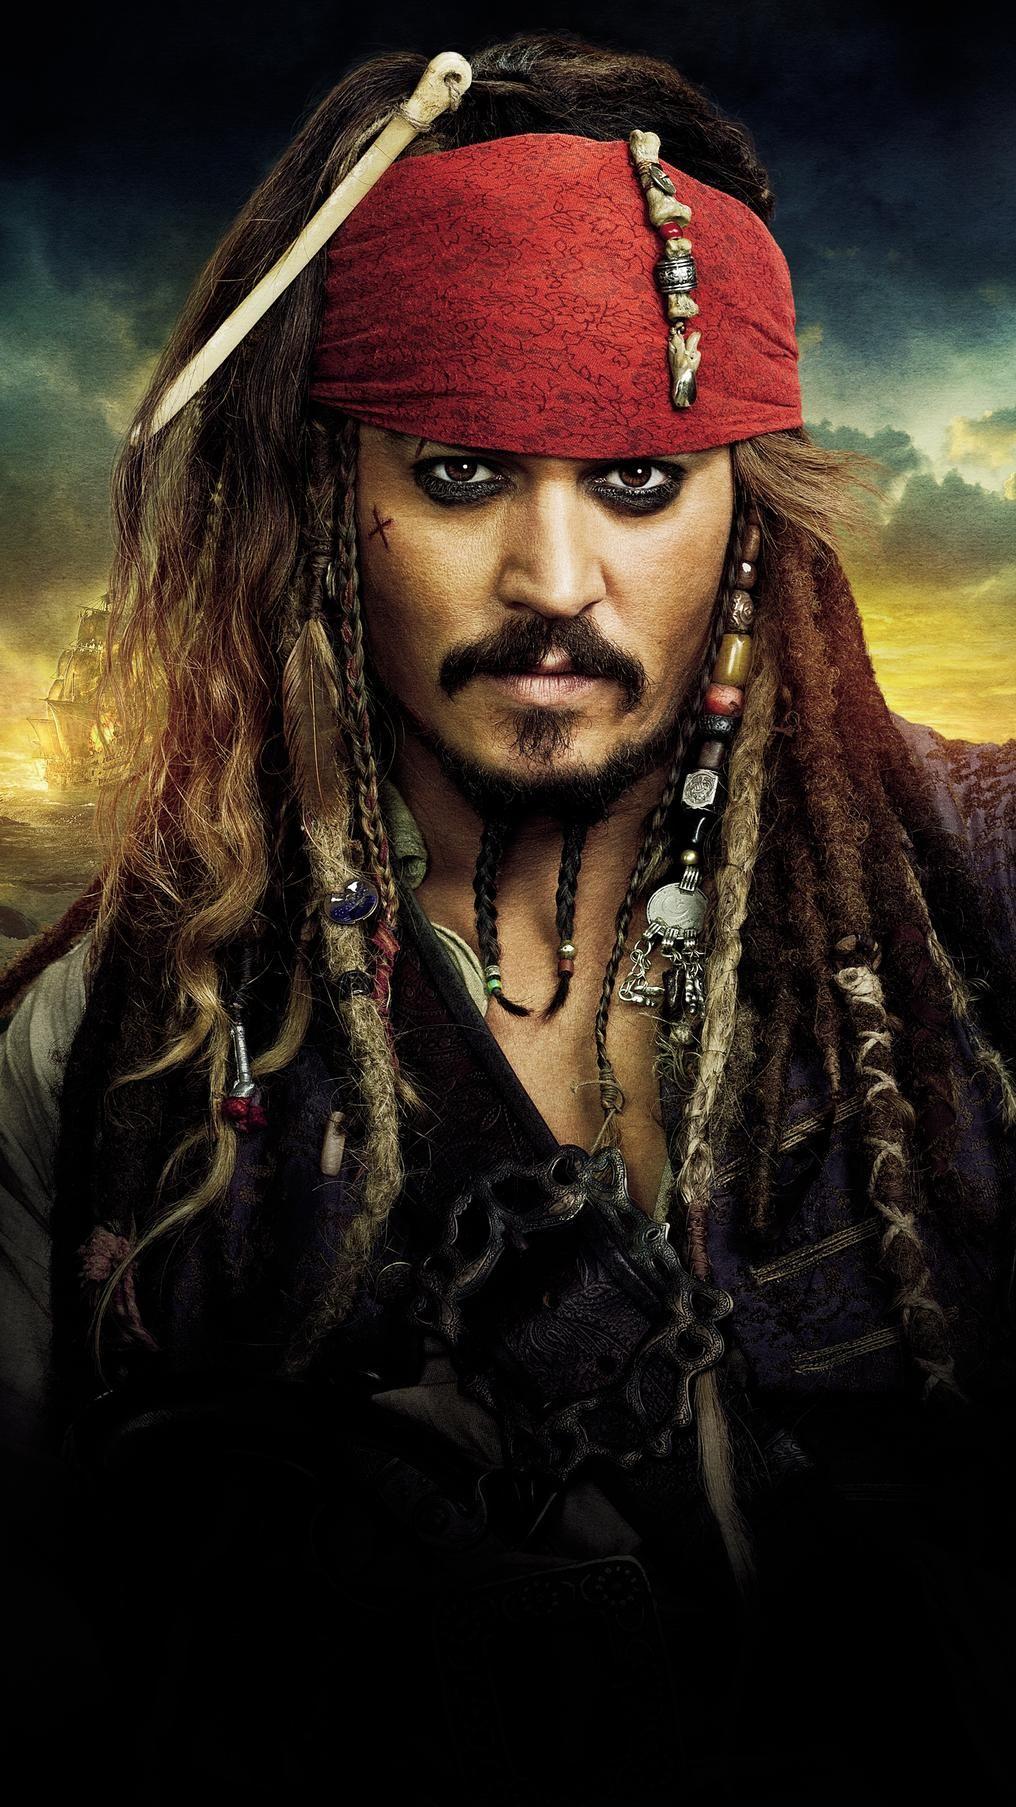 Alice Through The Looking Glass 2016 Phone Wallpaper Moviemania Jack Sparrow Tattoos Jack Sparrow Wallpaper Jack Sparrow Drawing